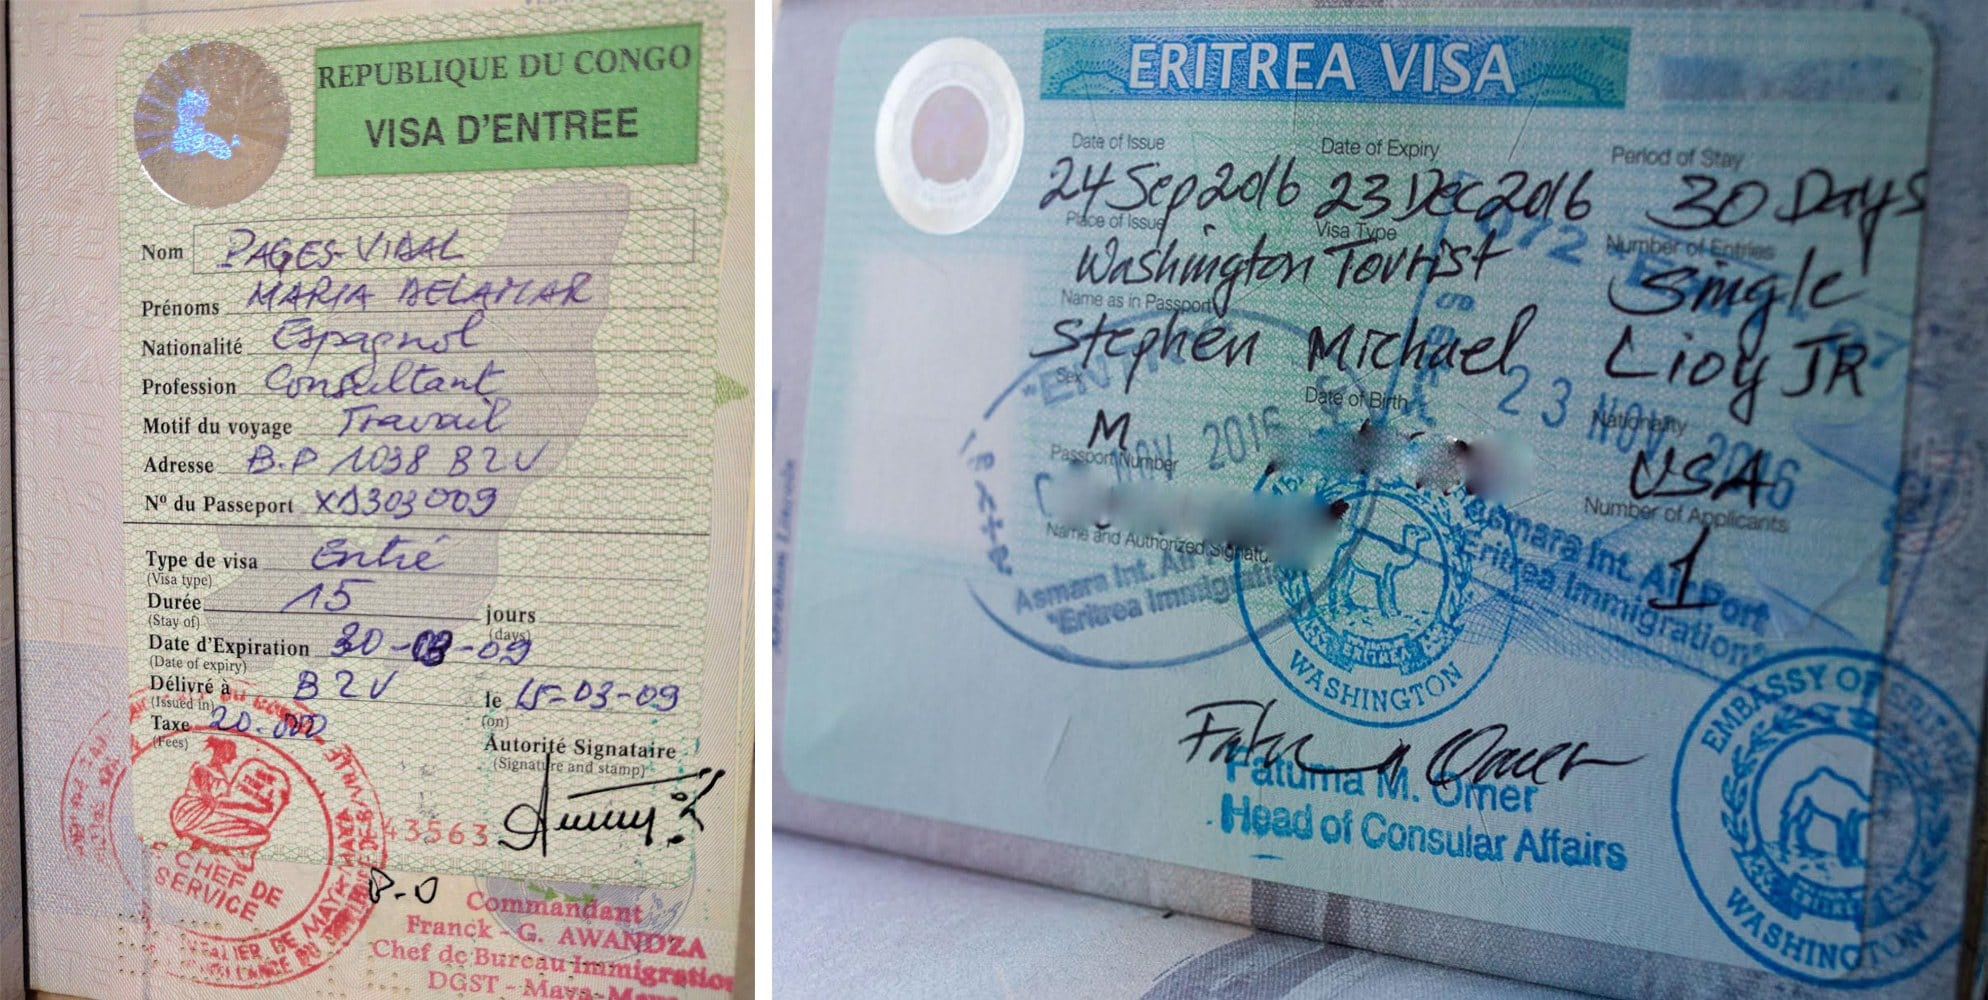 Passport Stamp For Congo And Eritrea